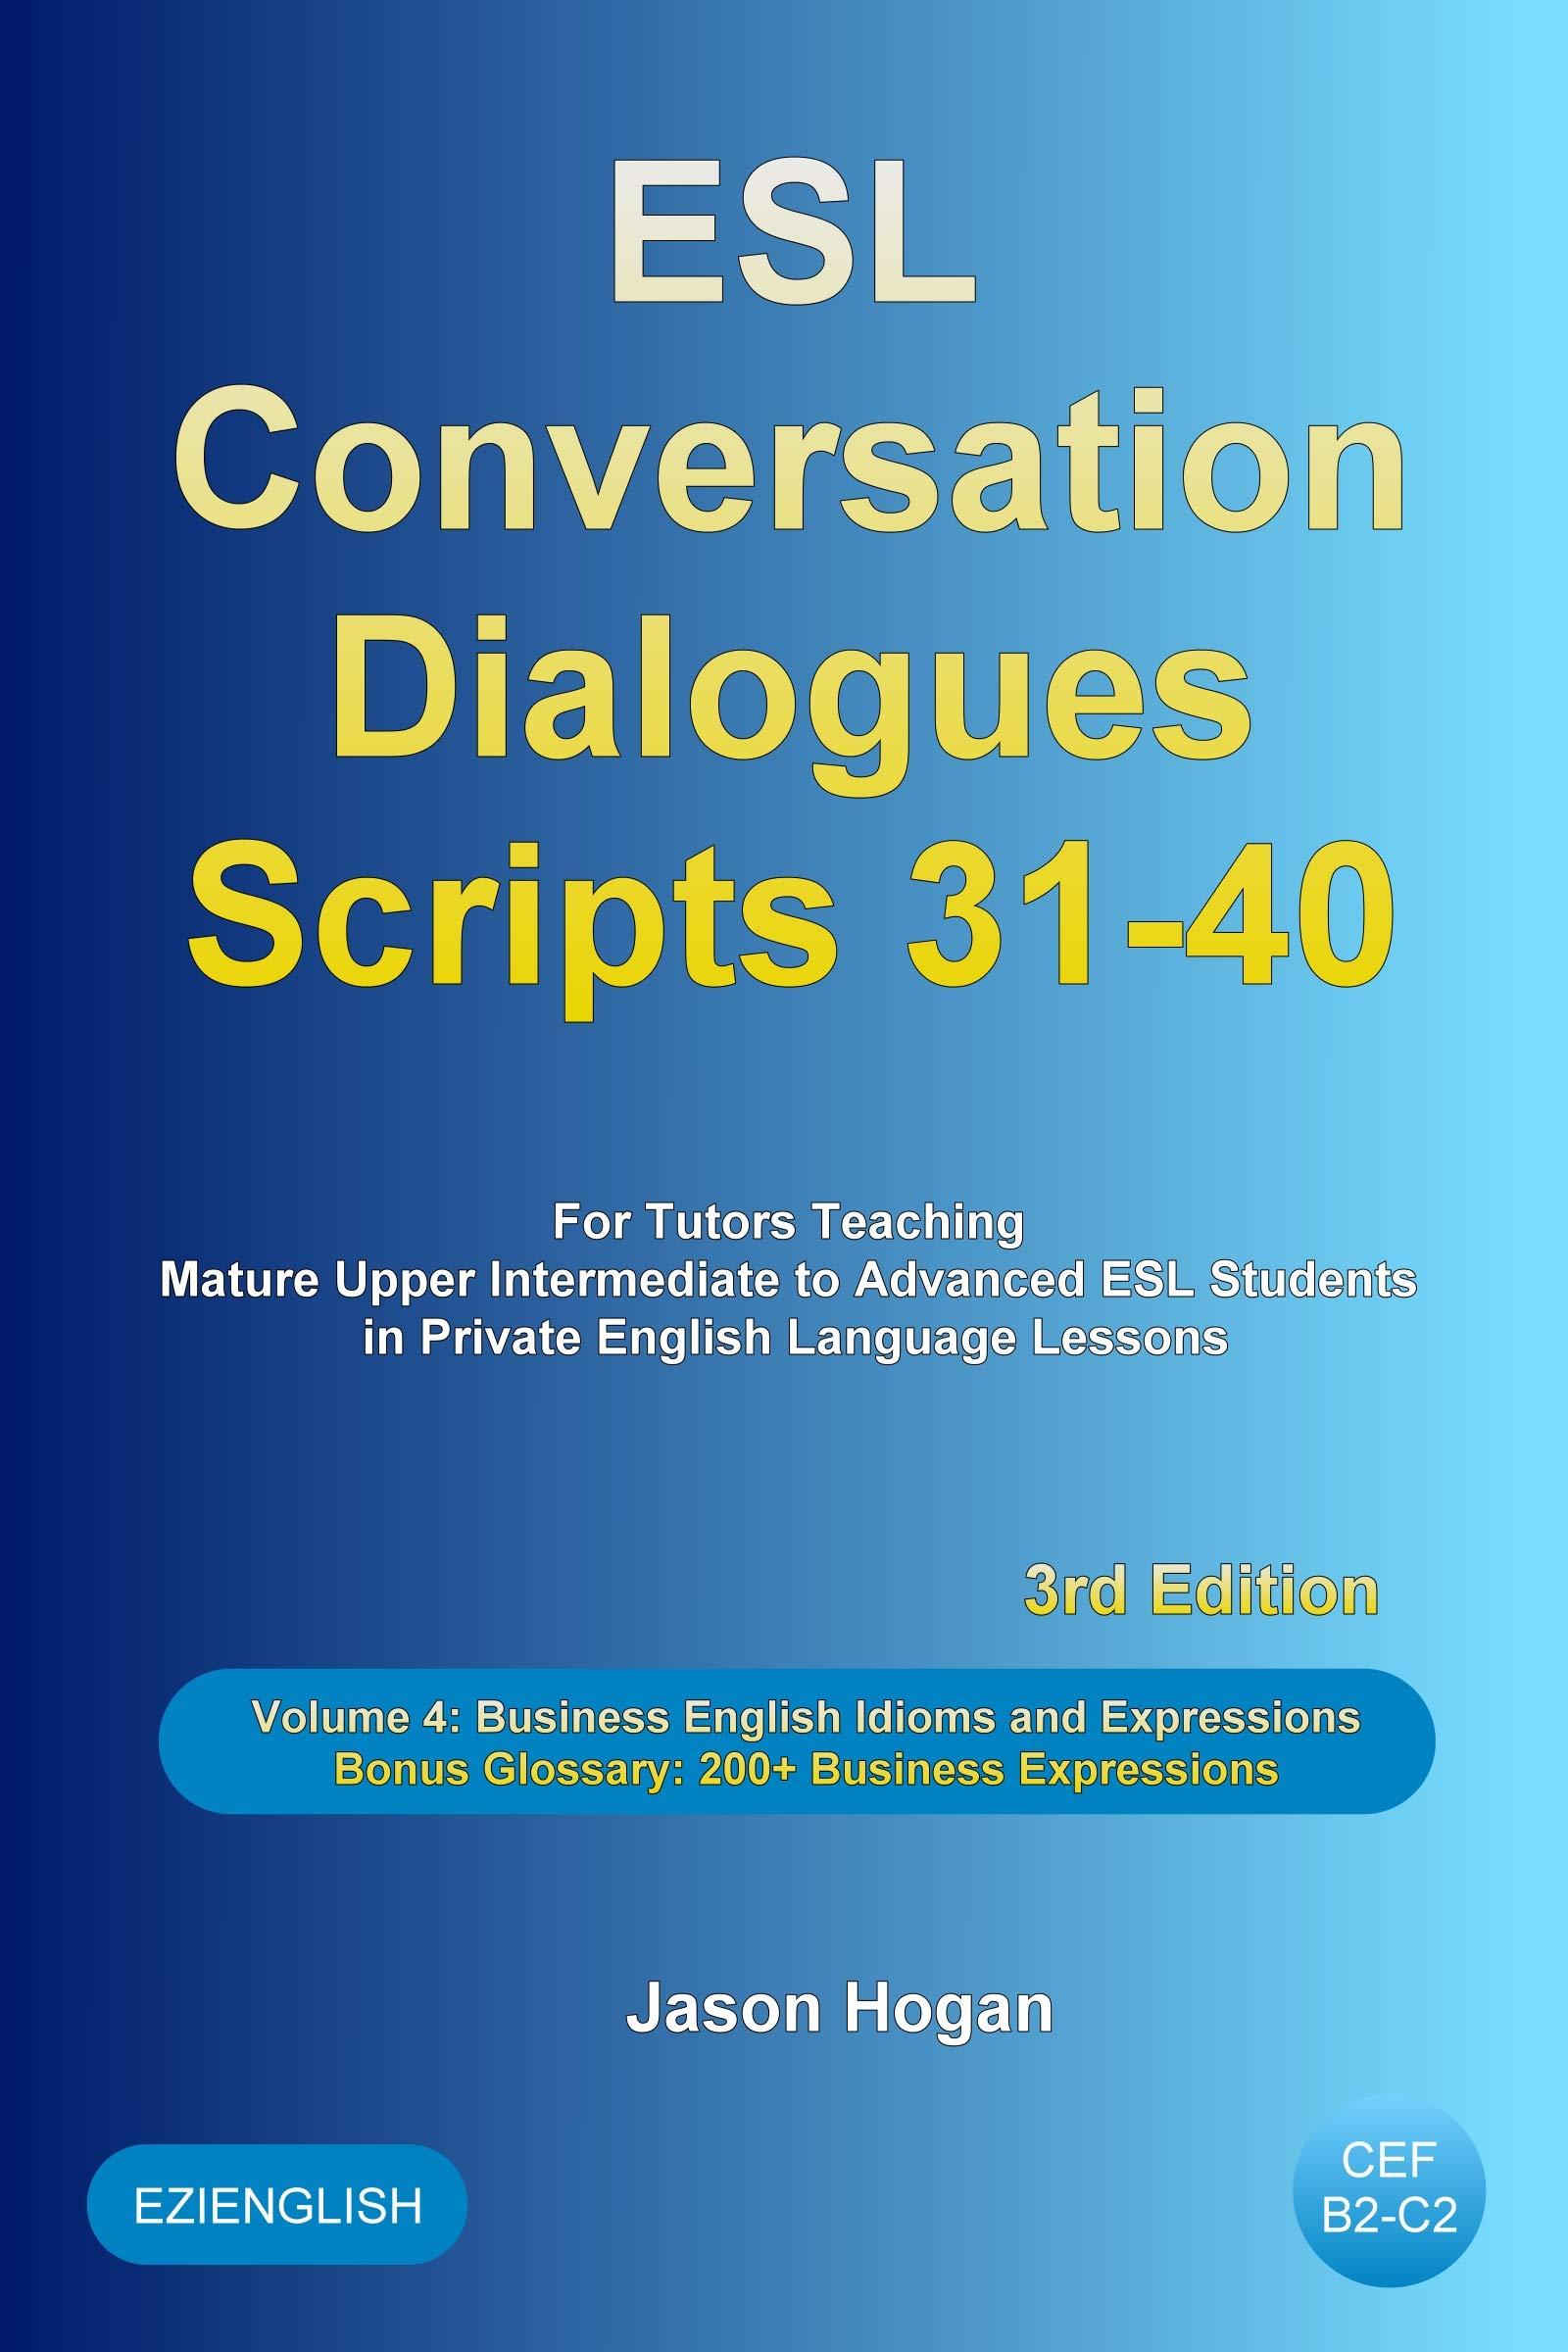 ESL Conversation Dialogues Scripts 31-40 Volume 4: Business English Idioms. Bonus Glossary: 200+ Business Expressions: For Tutors Teaching Mature Upper Intermediate to Advanced ESL Students